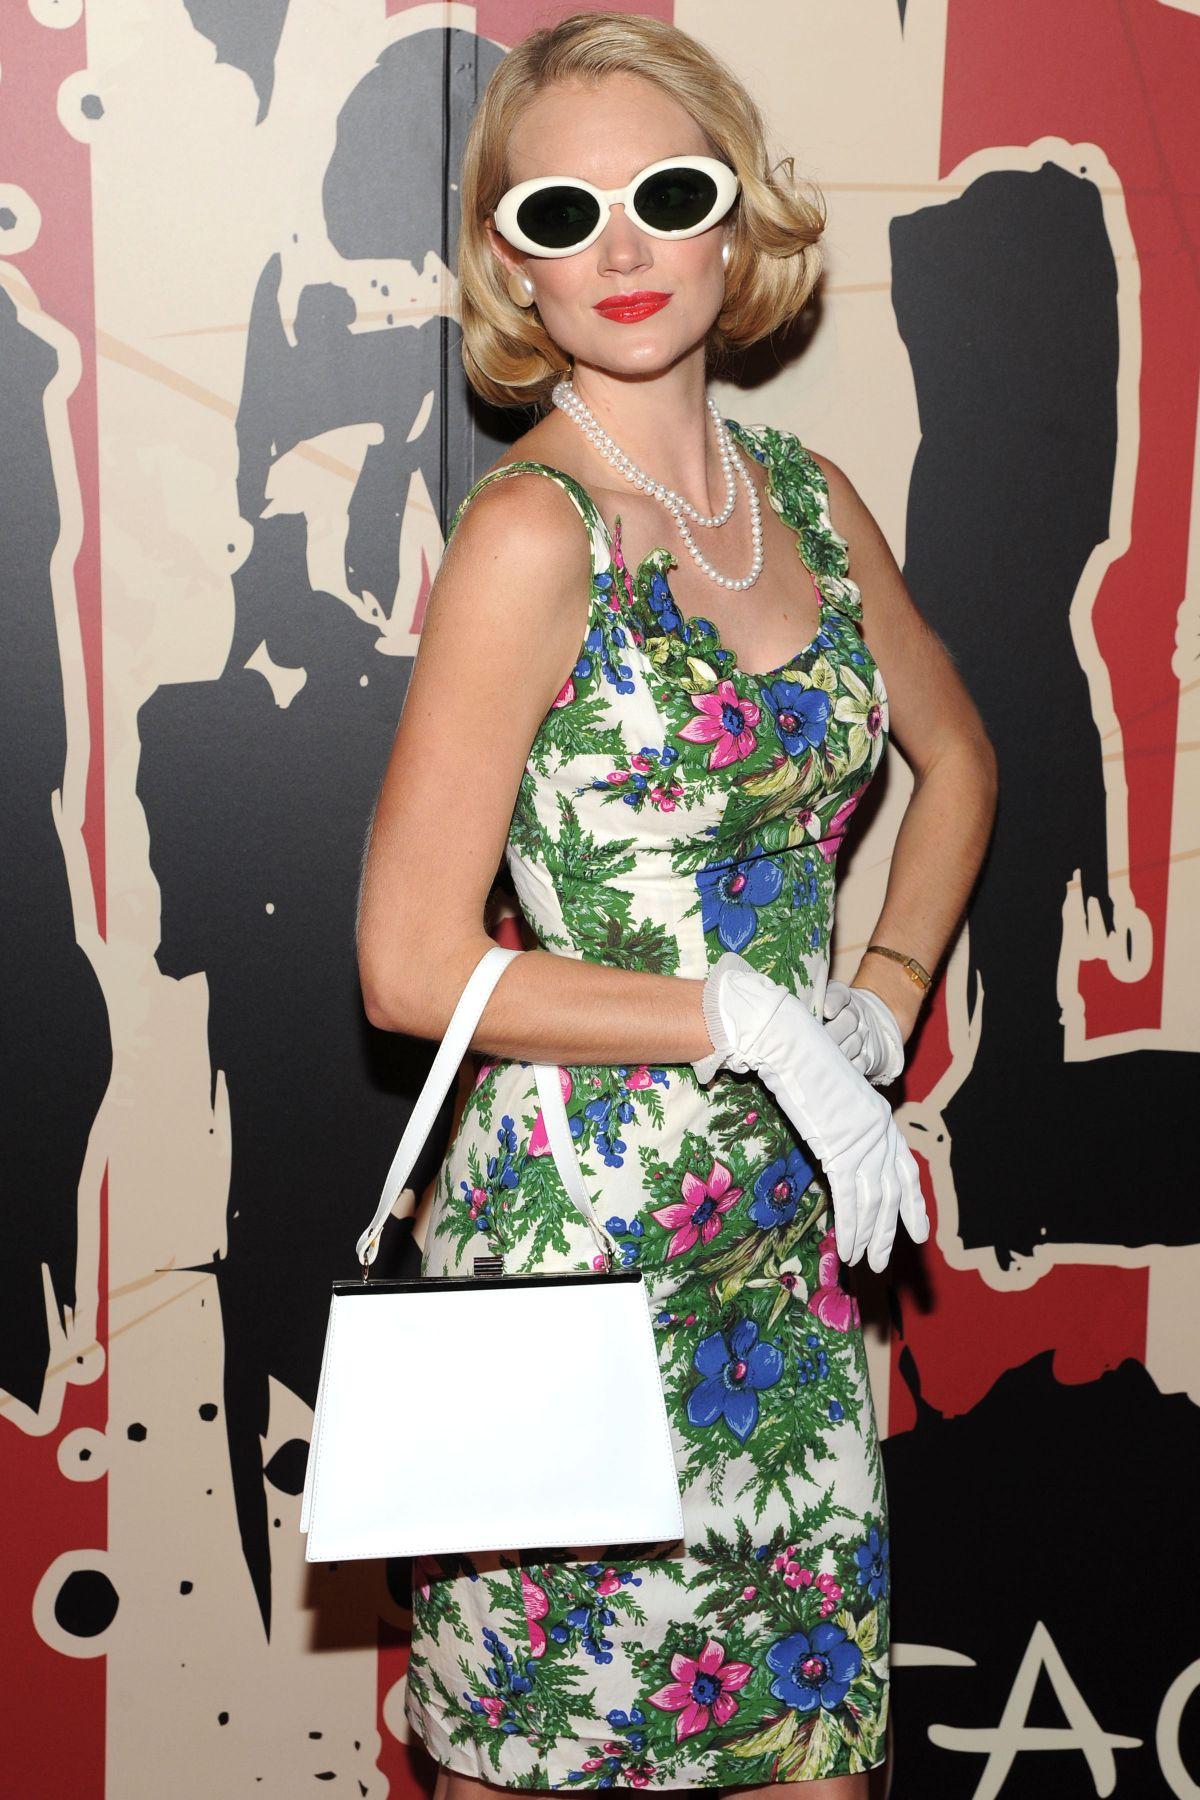 LINDSAY ELLINGSON at Heidi Klum's Halloween Party in New York ...